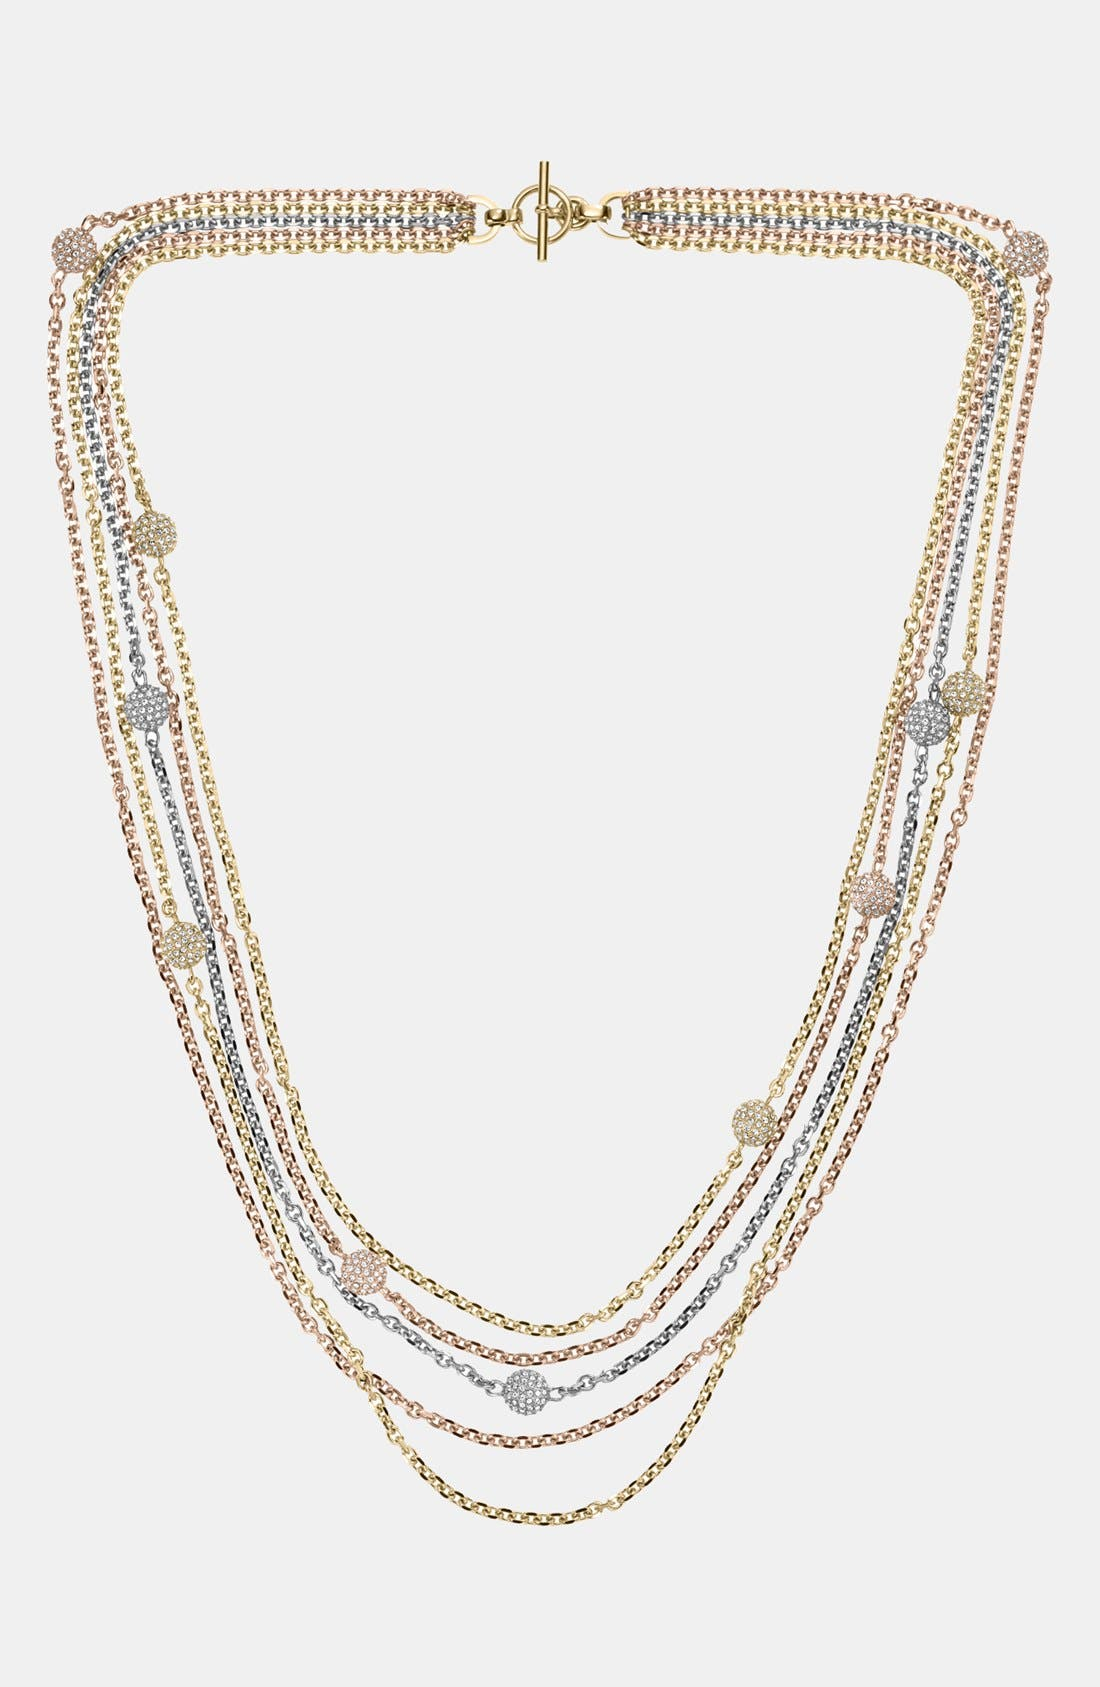 Alternate Image 1 Selected - Michael Kors 'Fireball' Station Multistrand Necklace